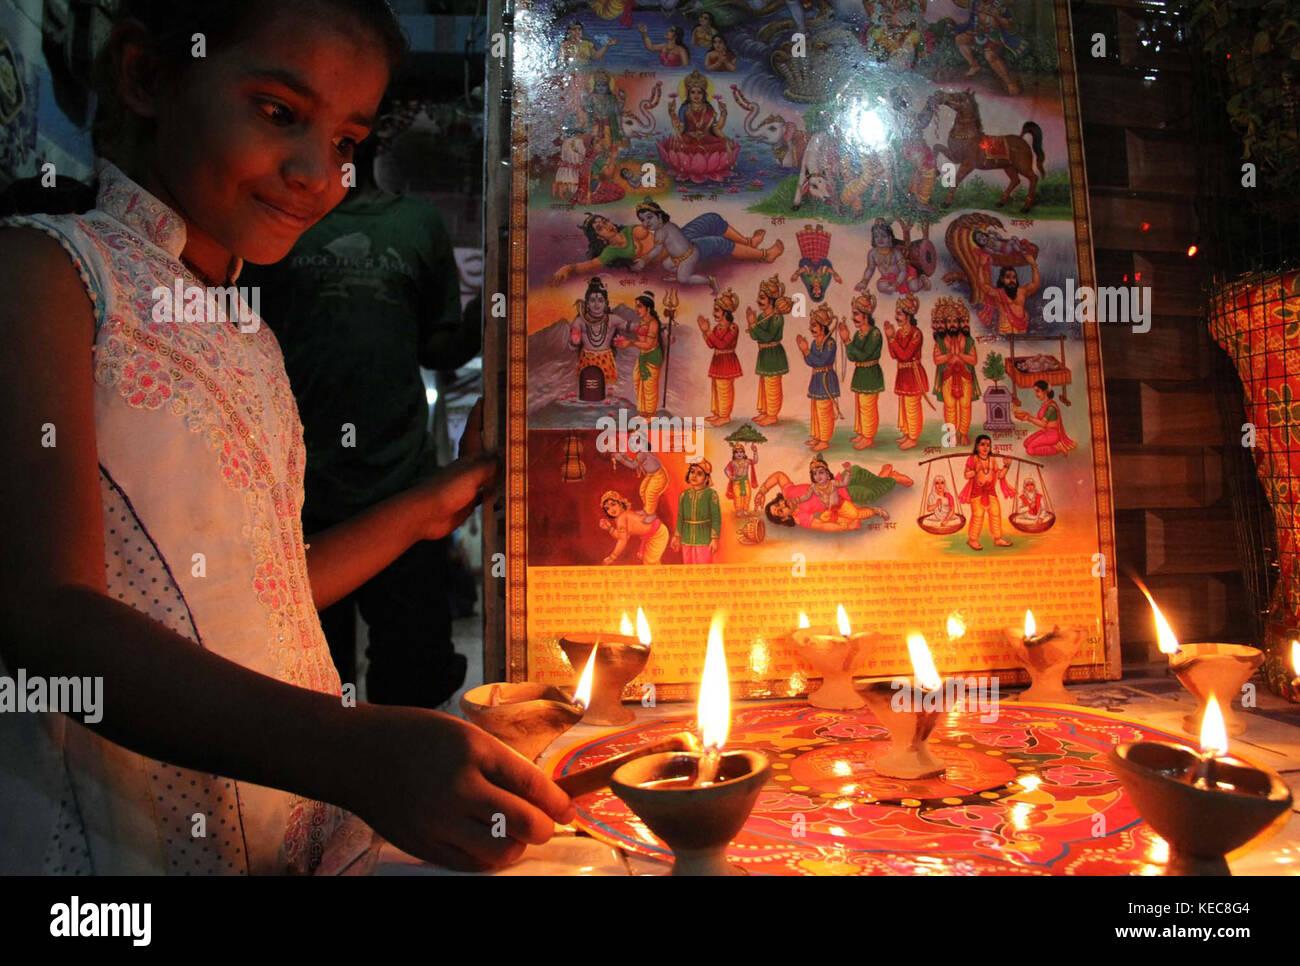 Hindu community of Karachi celebrating festival Diwali on Thursday, October 19, 2017. Diwali is a festival of lights - Stock Image